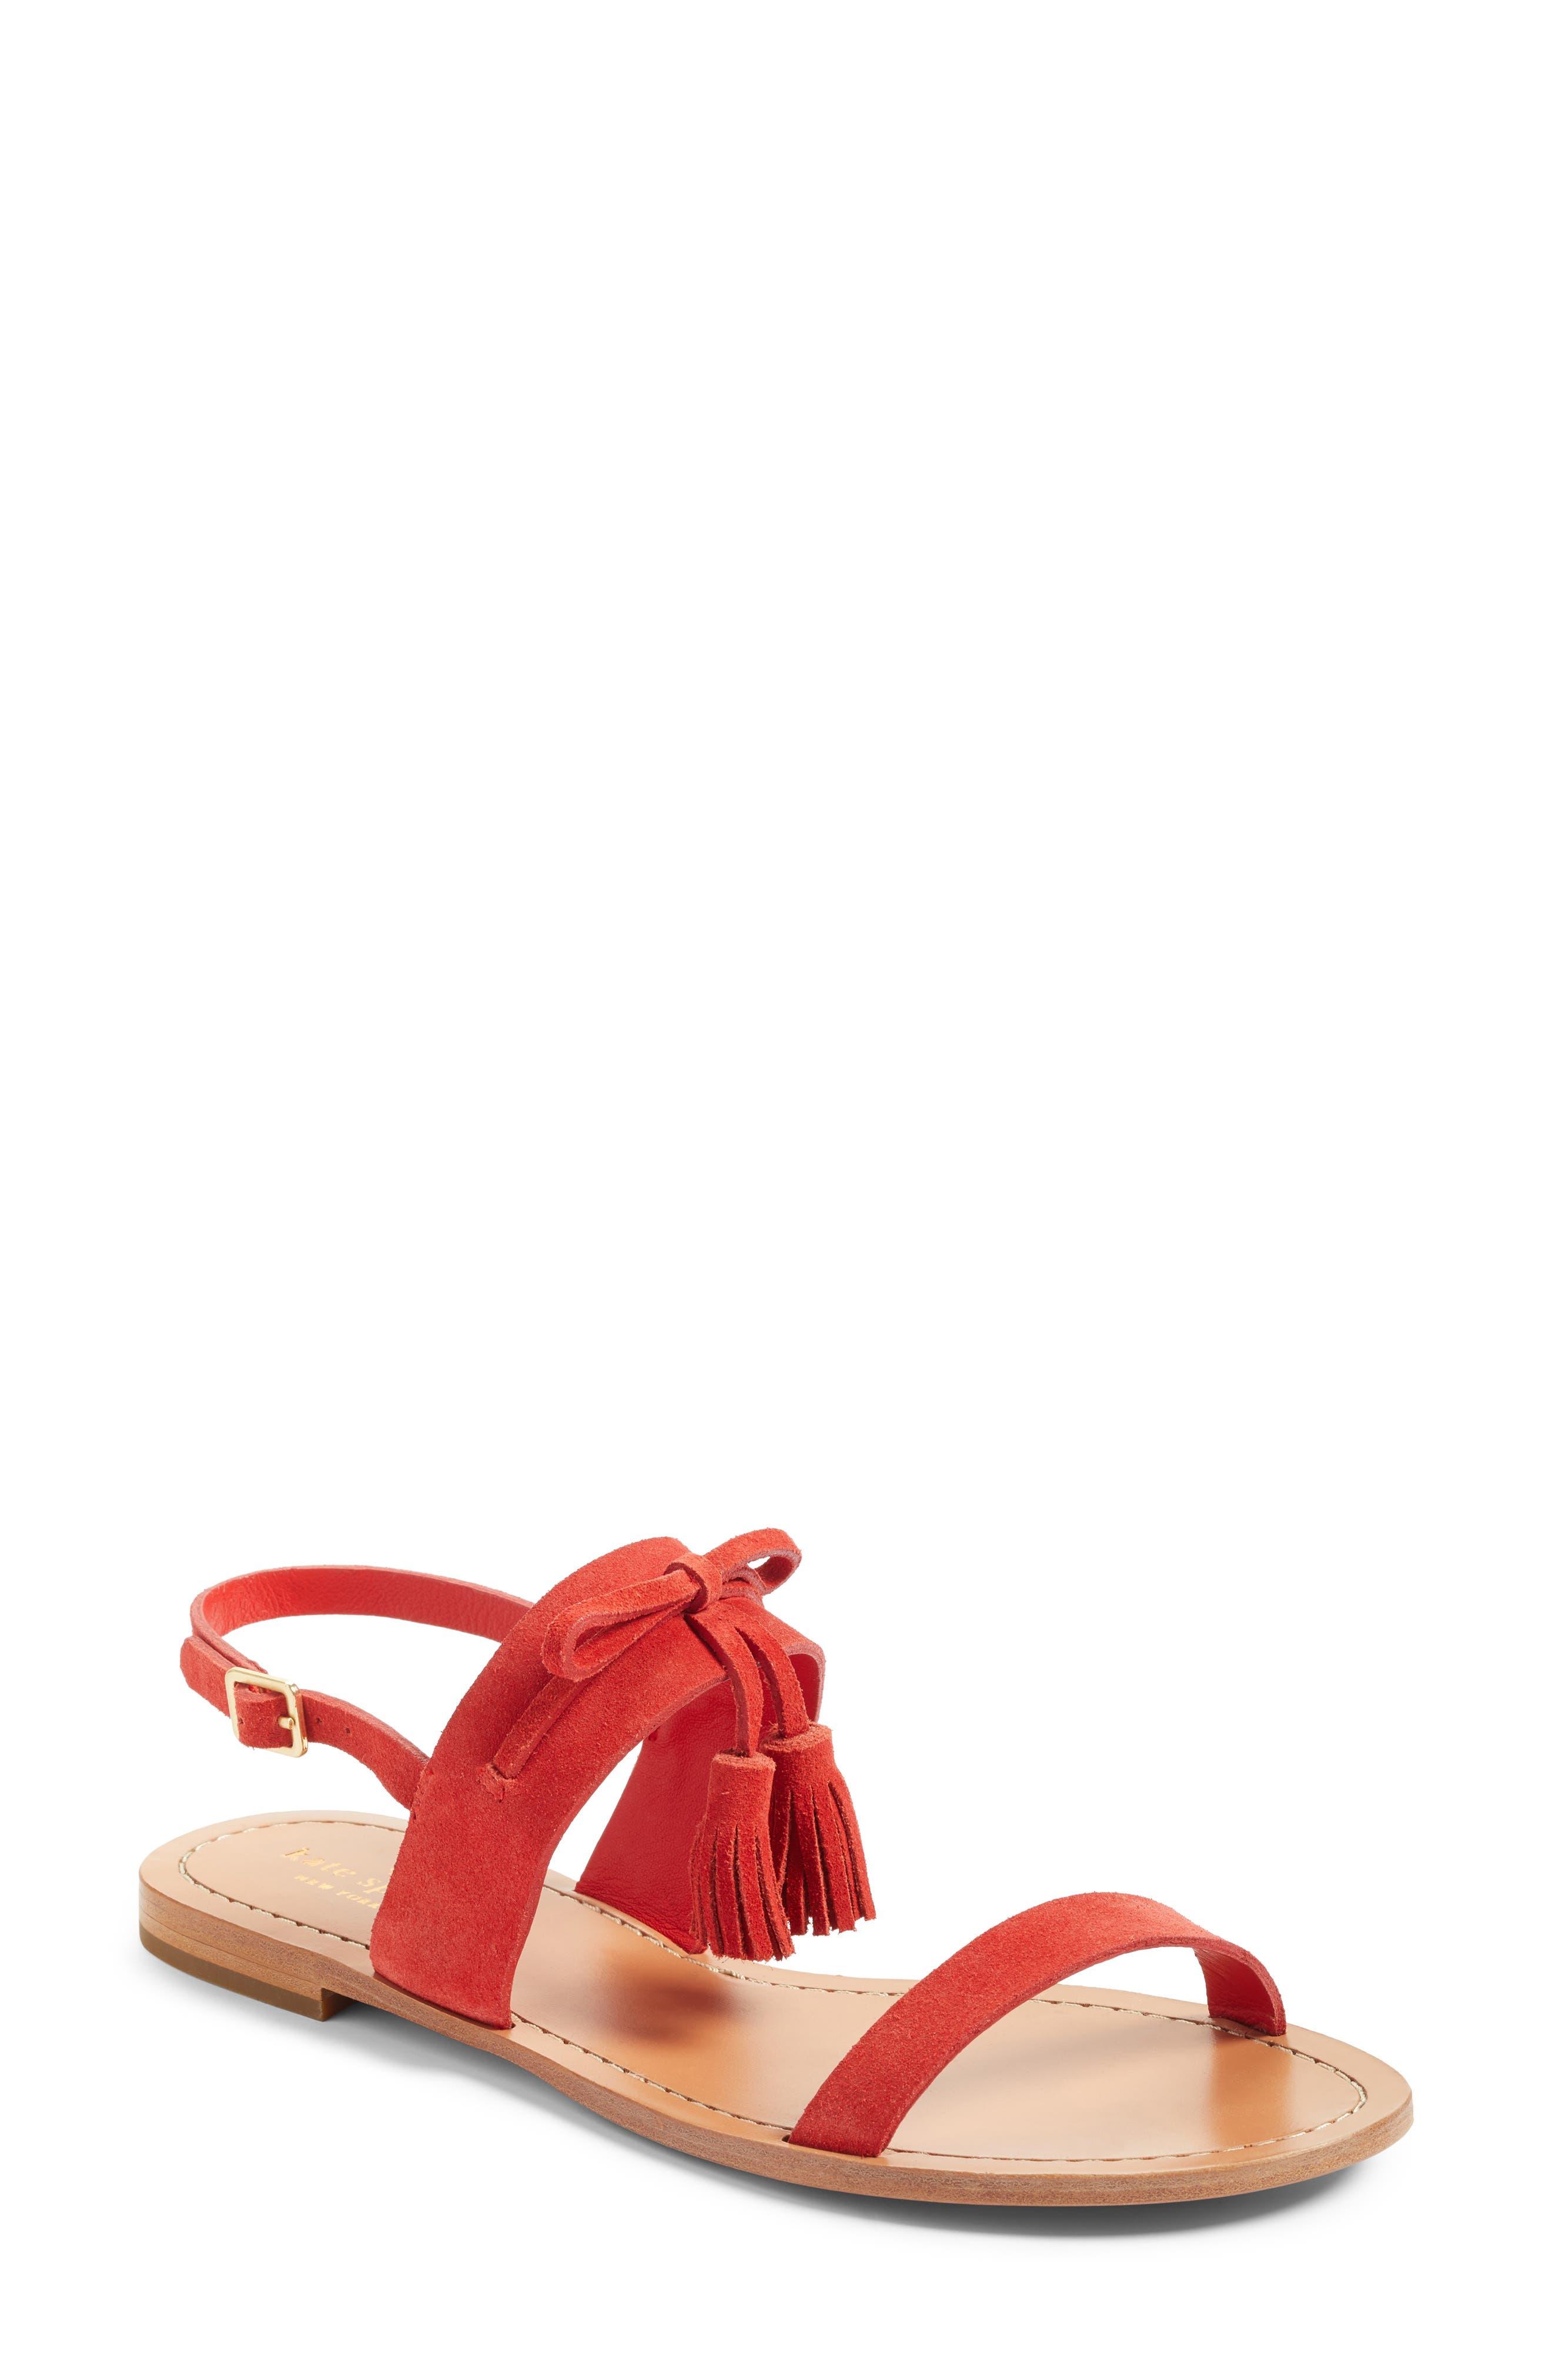 kate spade new york carlita tassel sandal (Women)